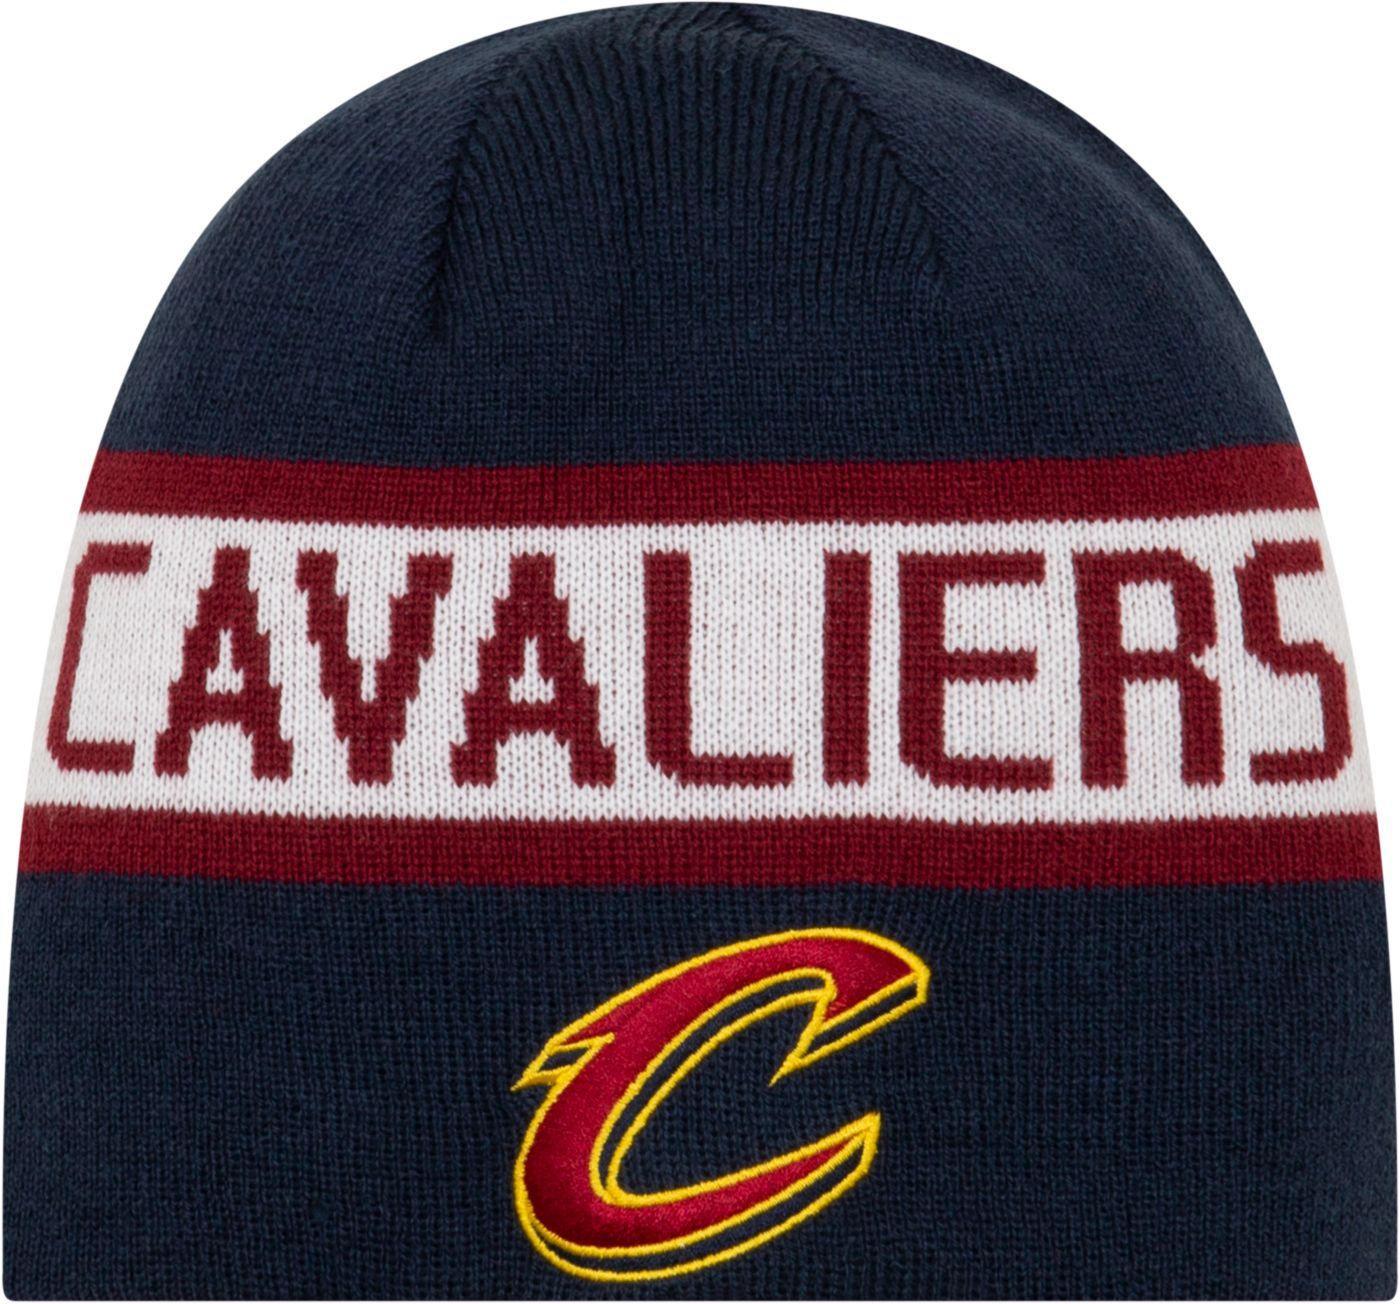 New Era Men's Cleveland Cavaliers Reversible Sports Knit Hat